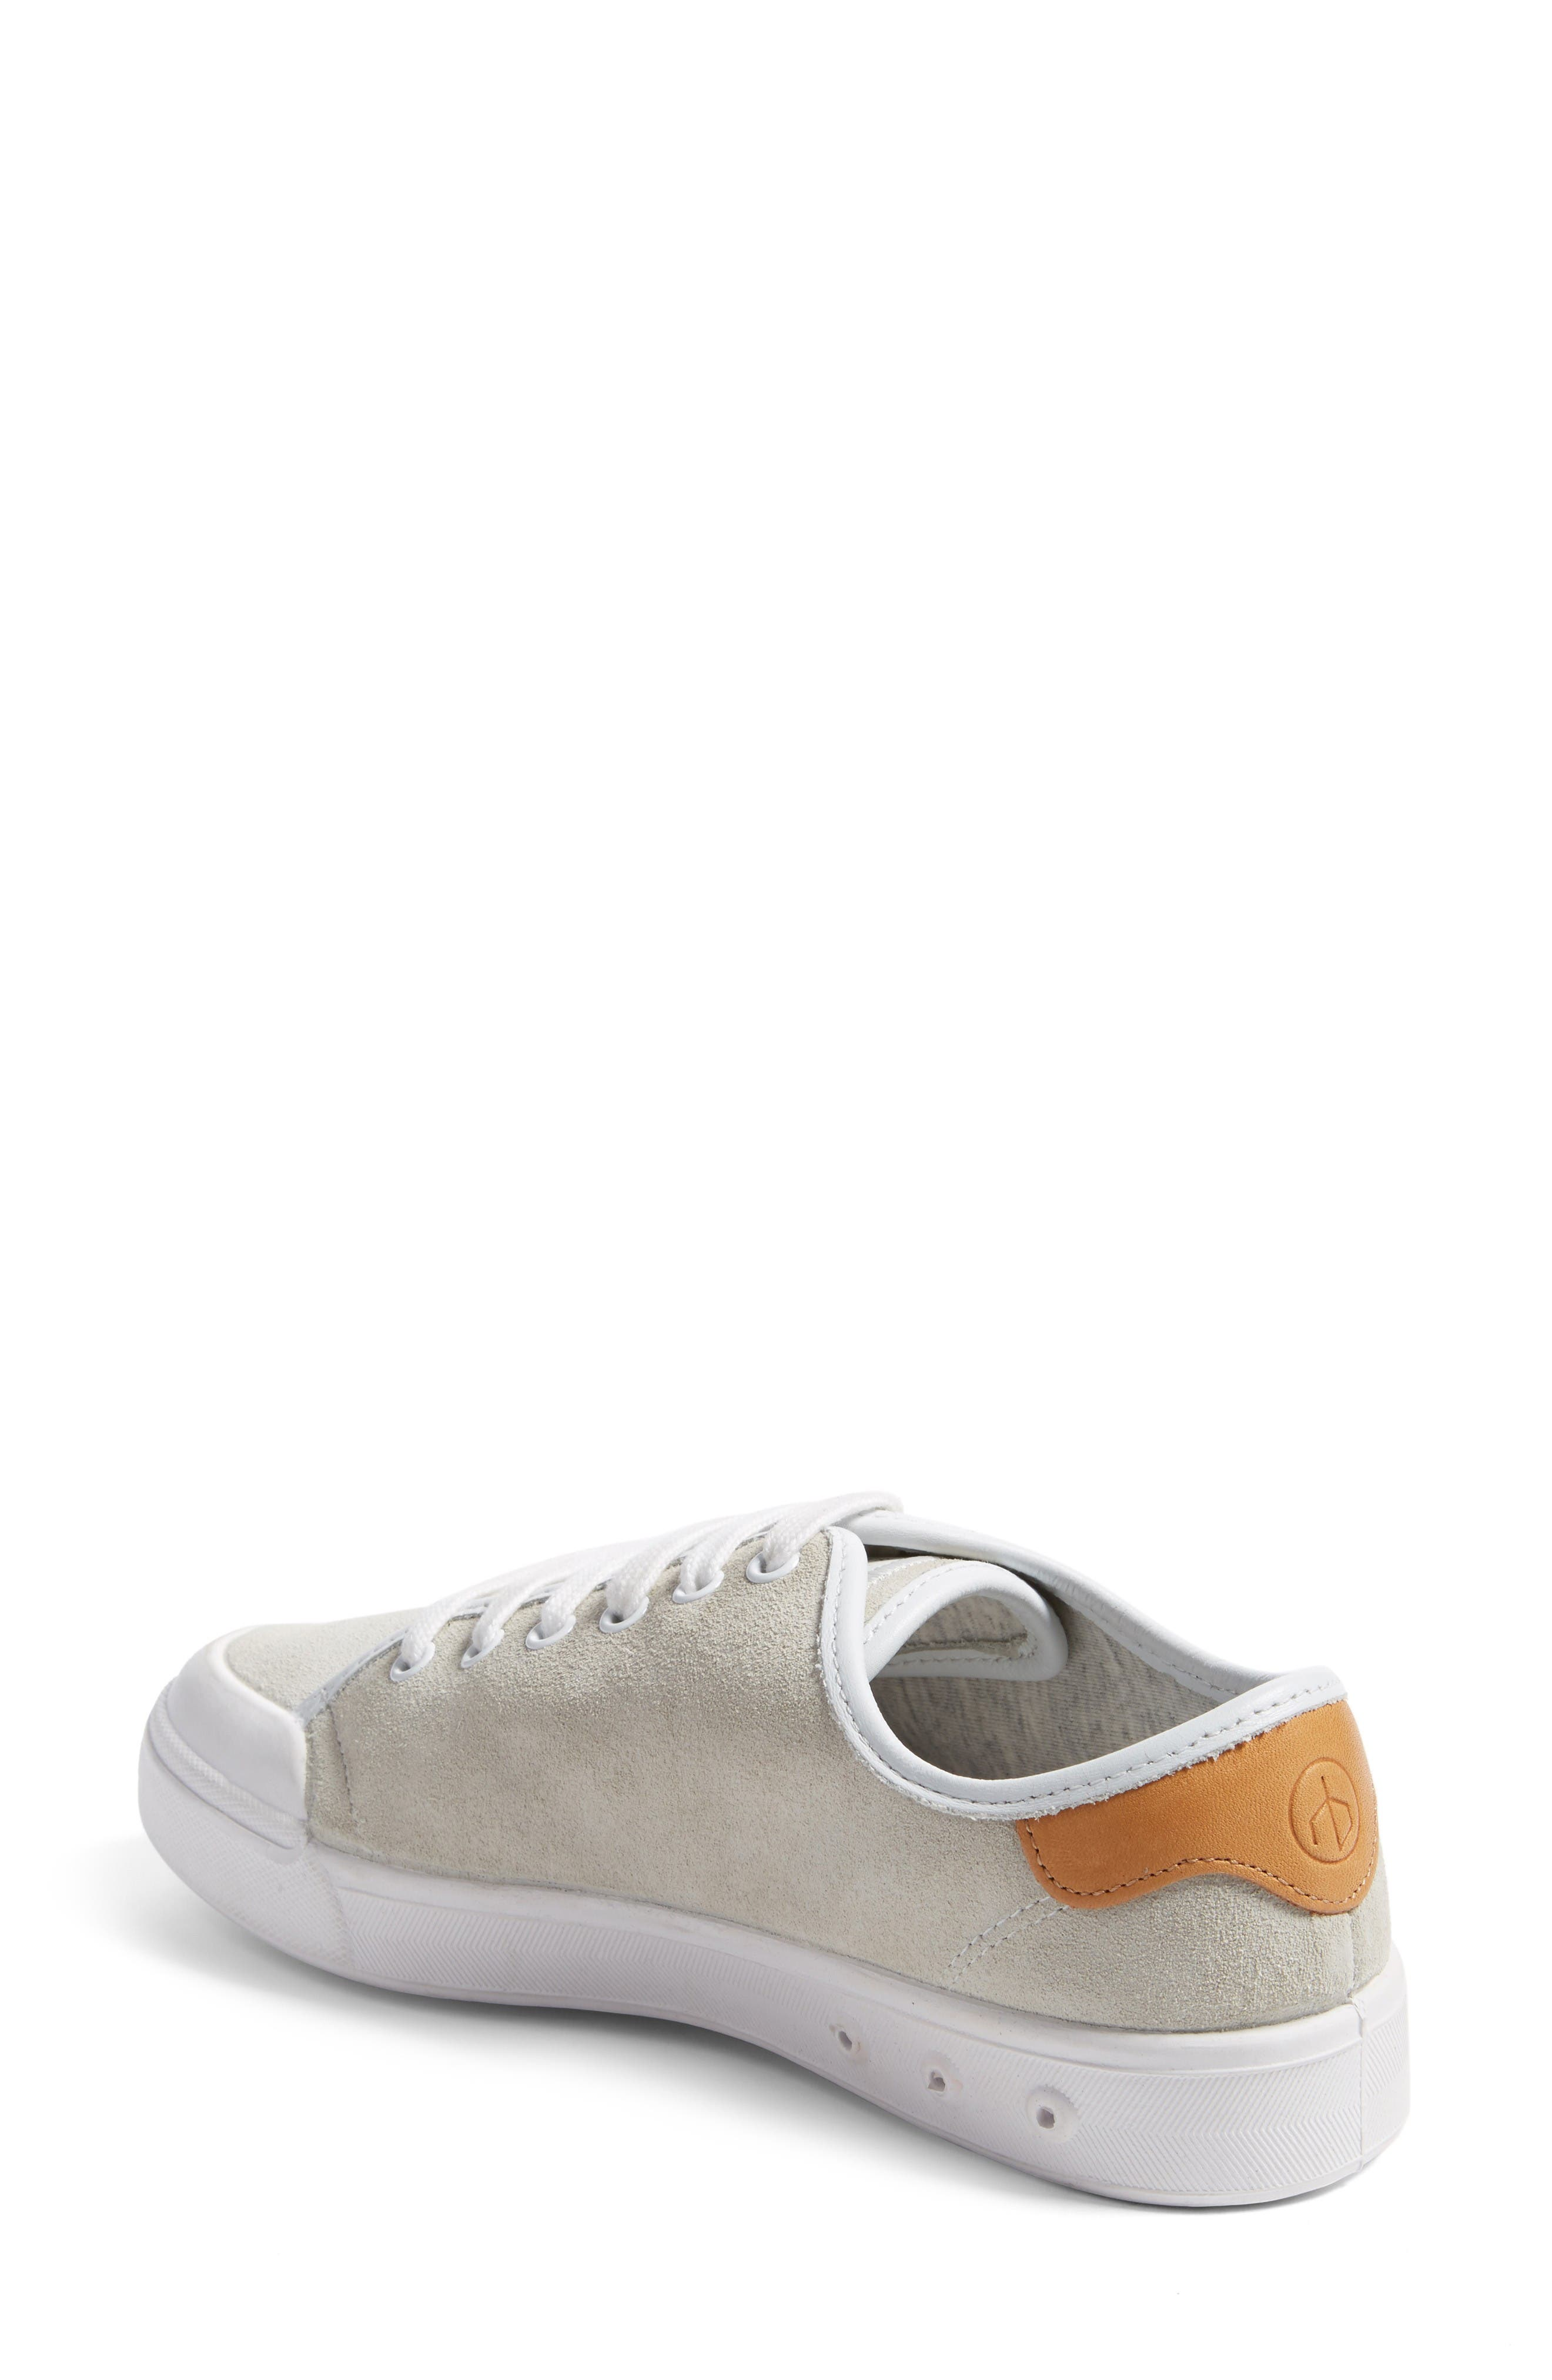 Alternate Image 2  - rag & bone Standard Issue Sneaker (Women)